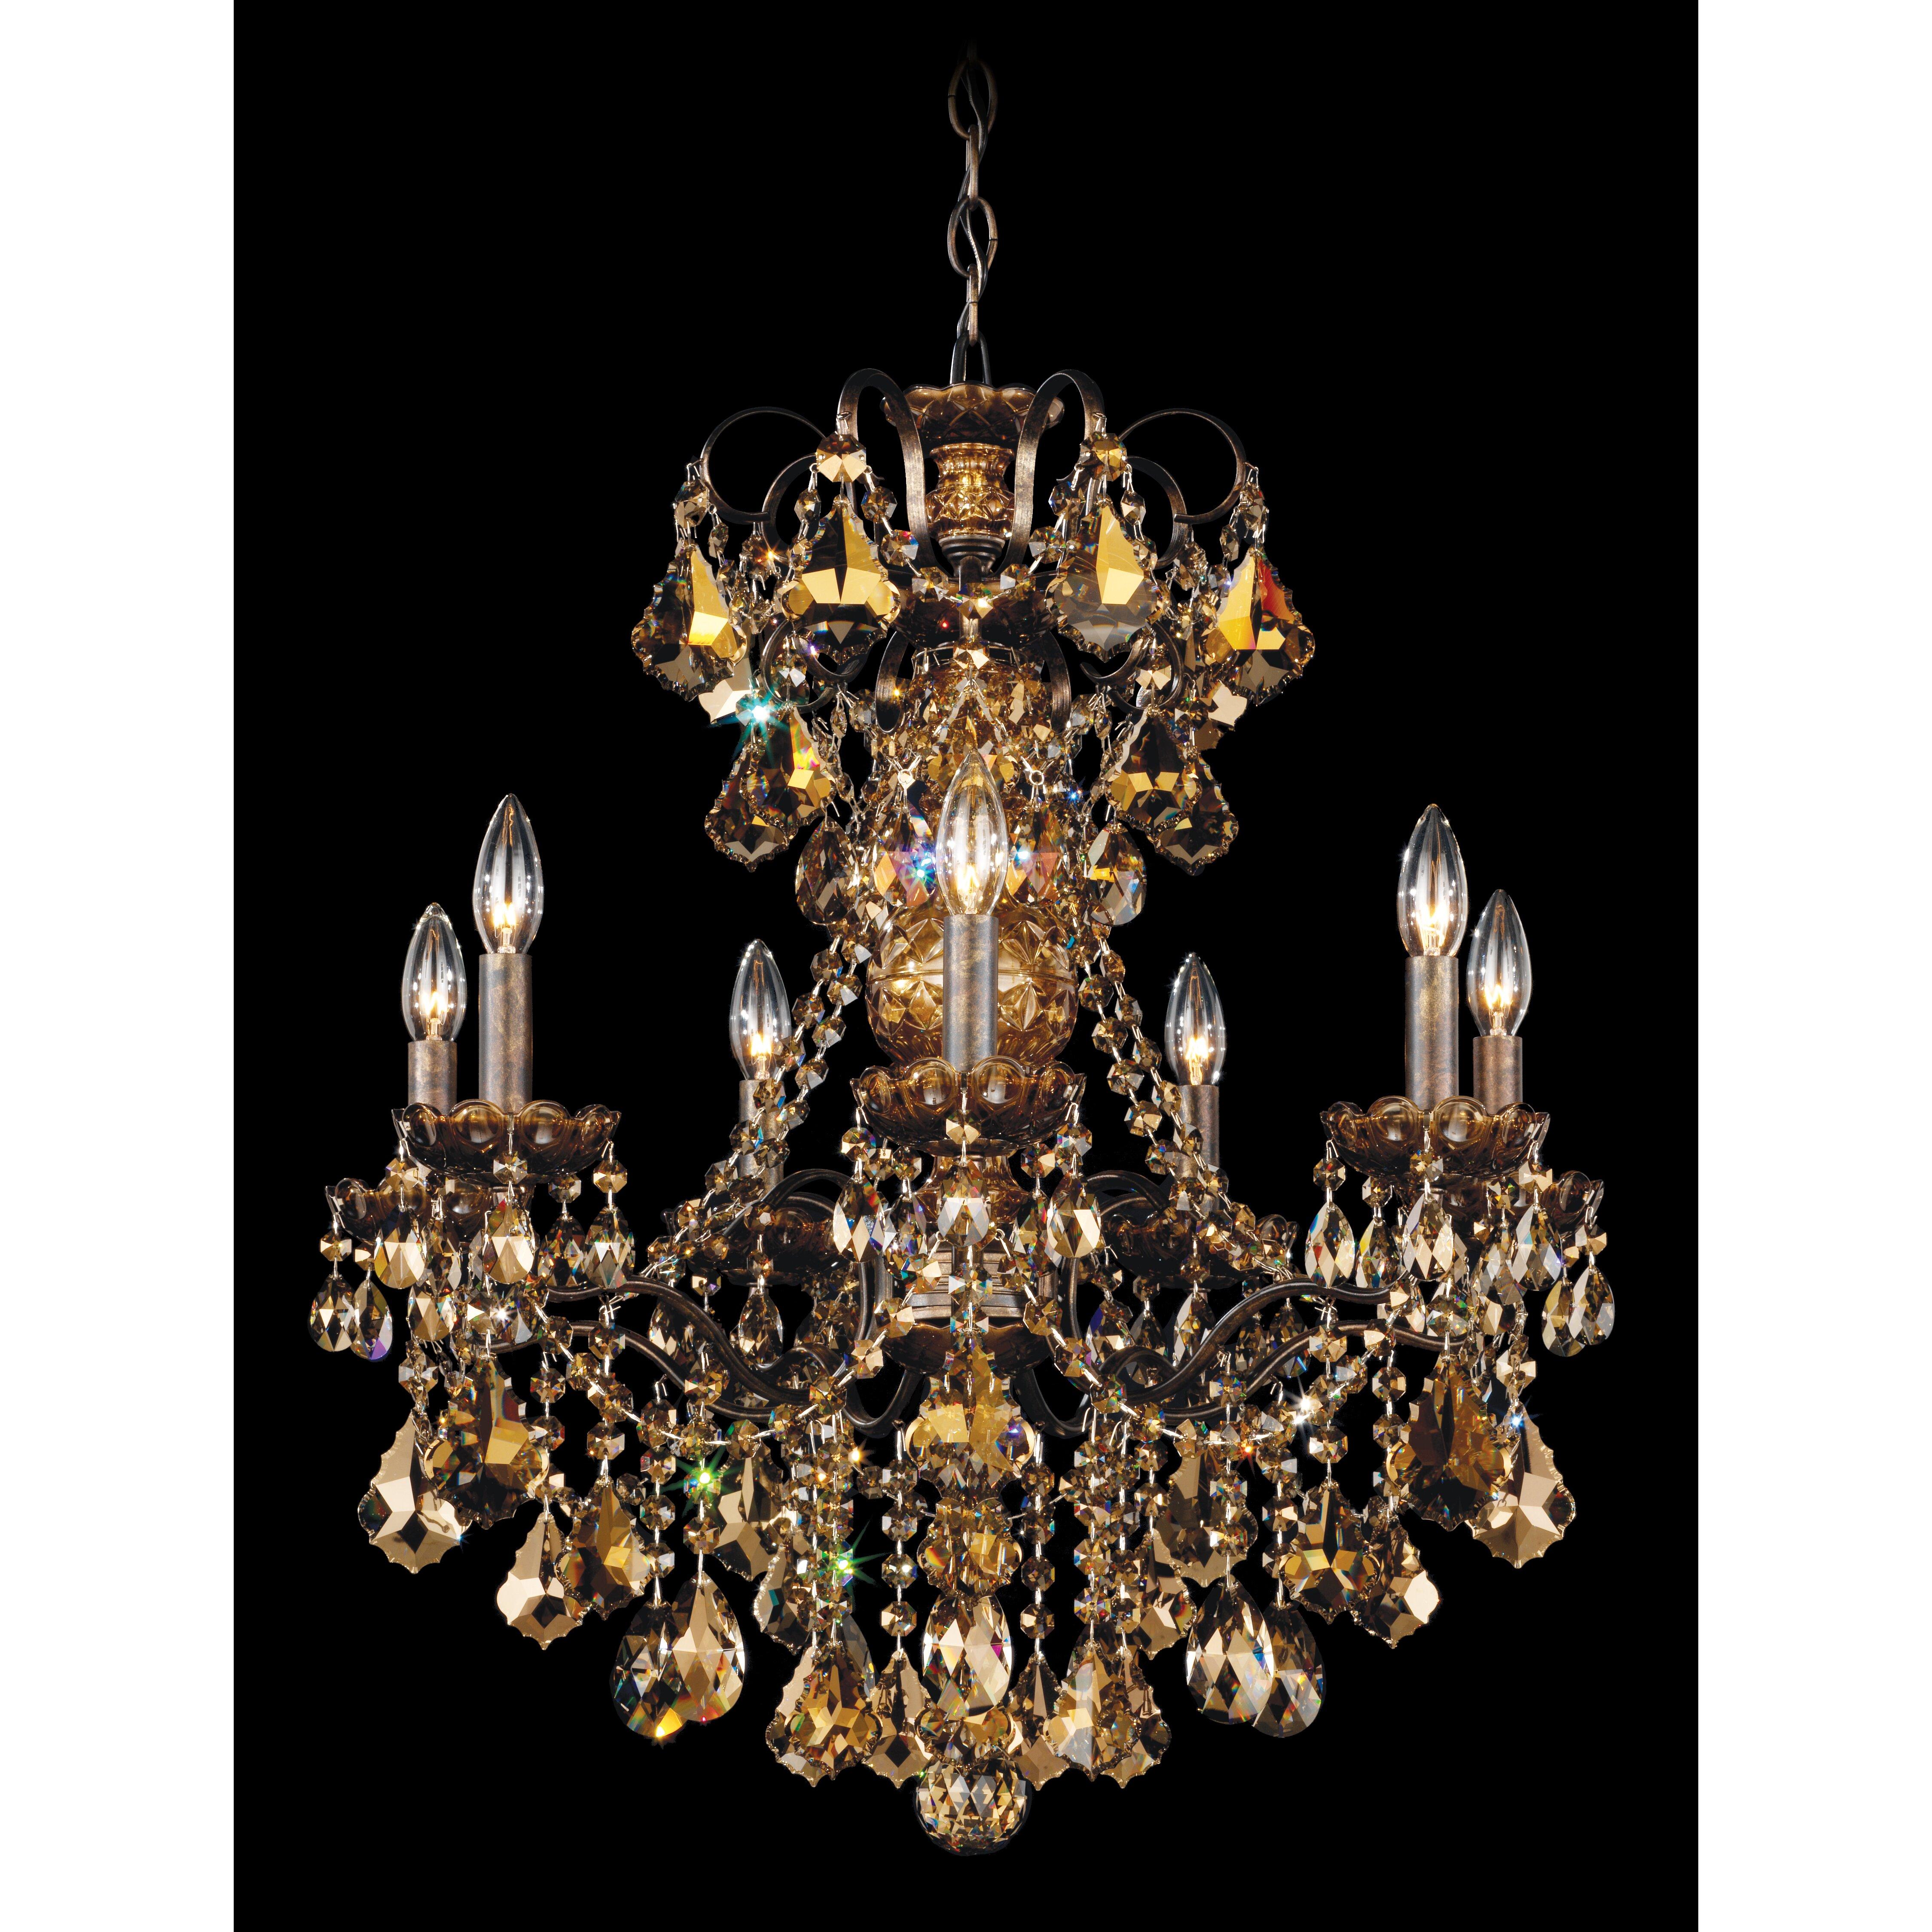 Schonbek Chandelier Wayfair: Schonbek New Orleans 7 Light Crystal Chandelier & Reviews